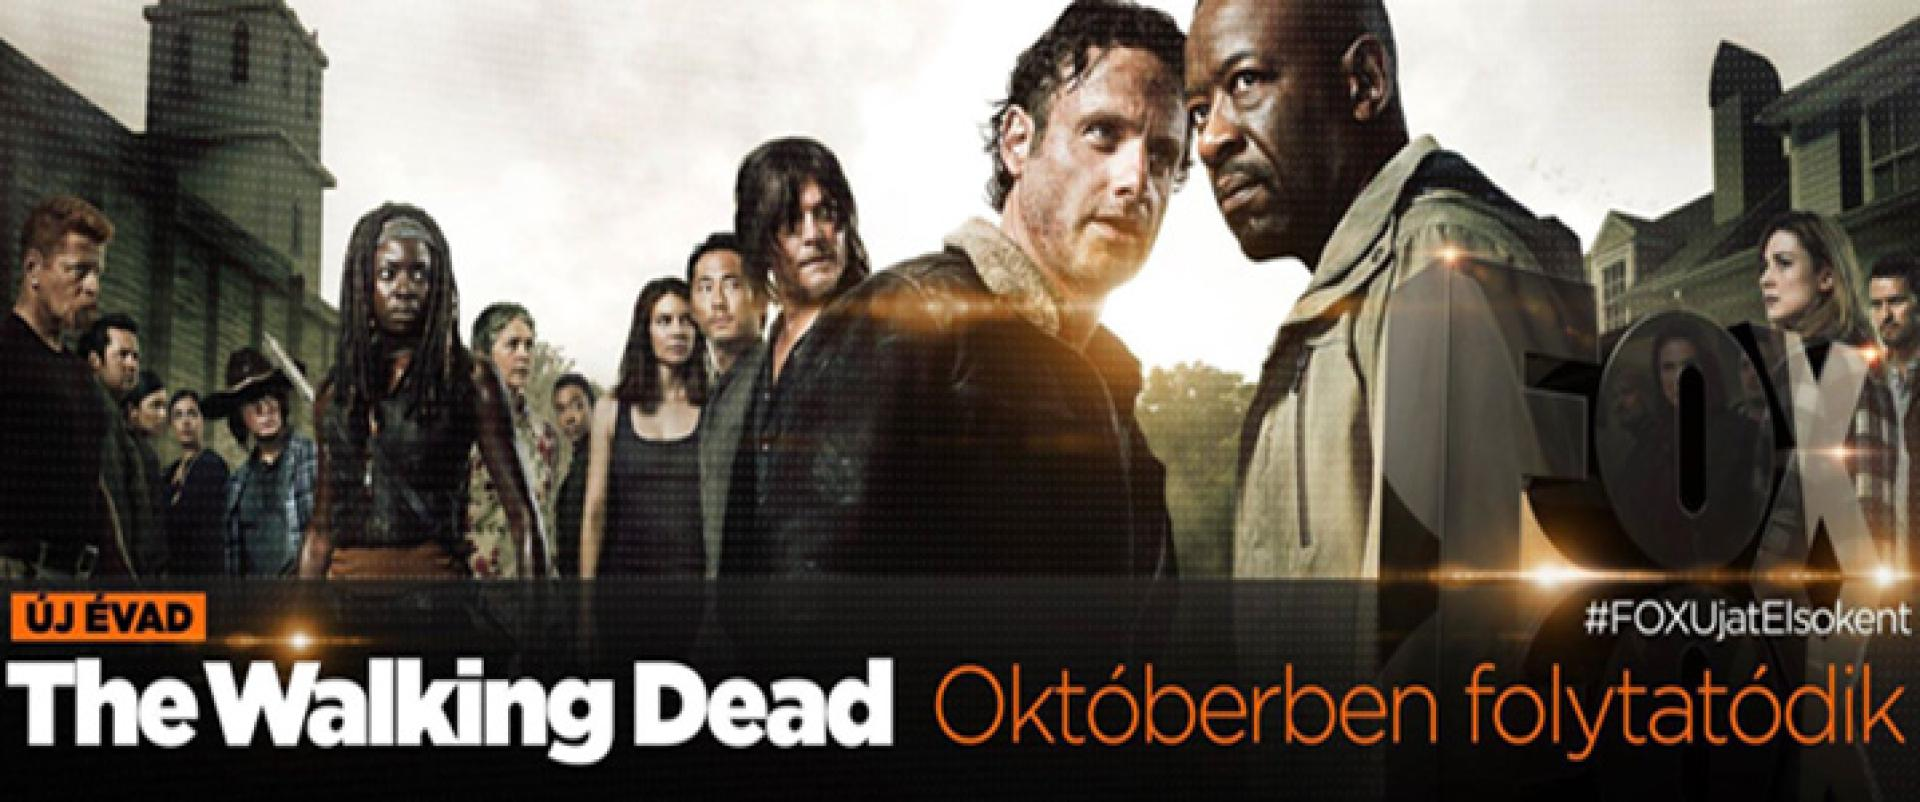 The Walking Dead, 6. évad: képhorda